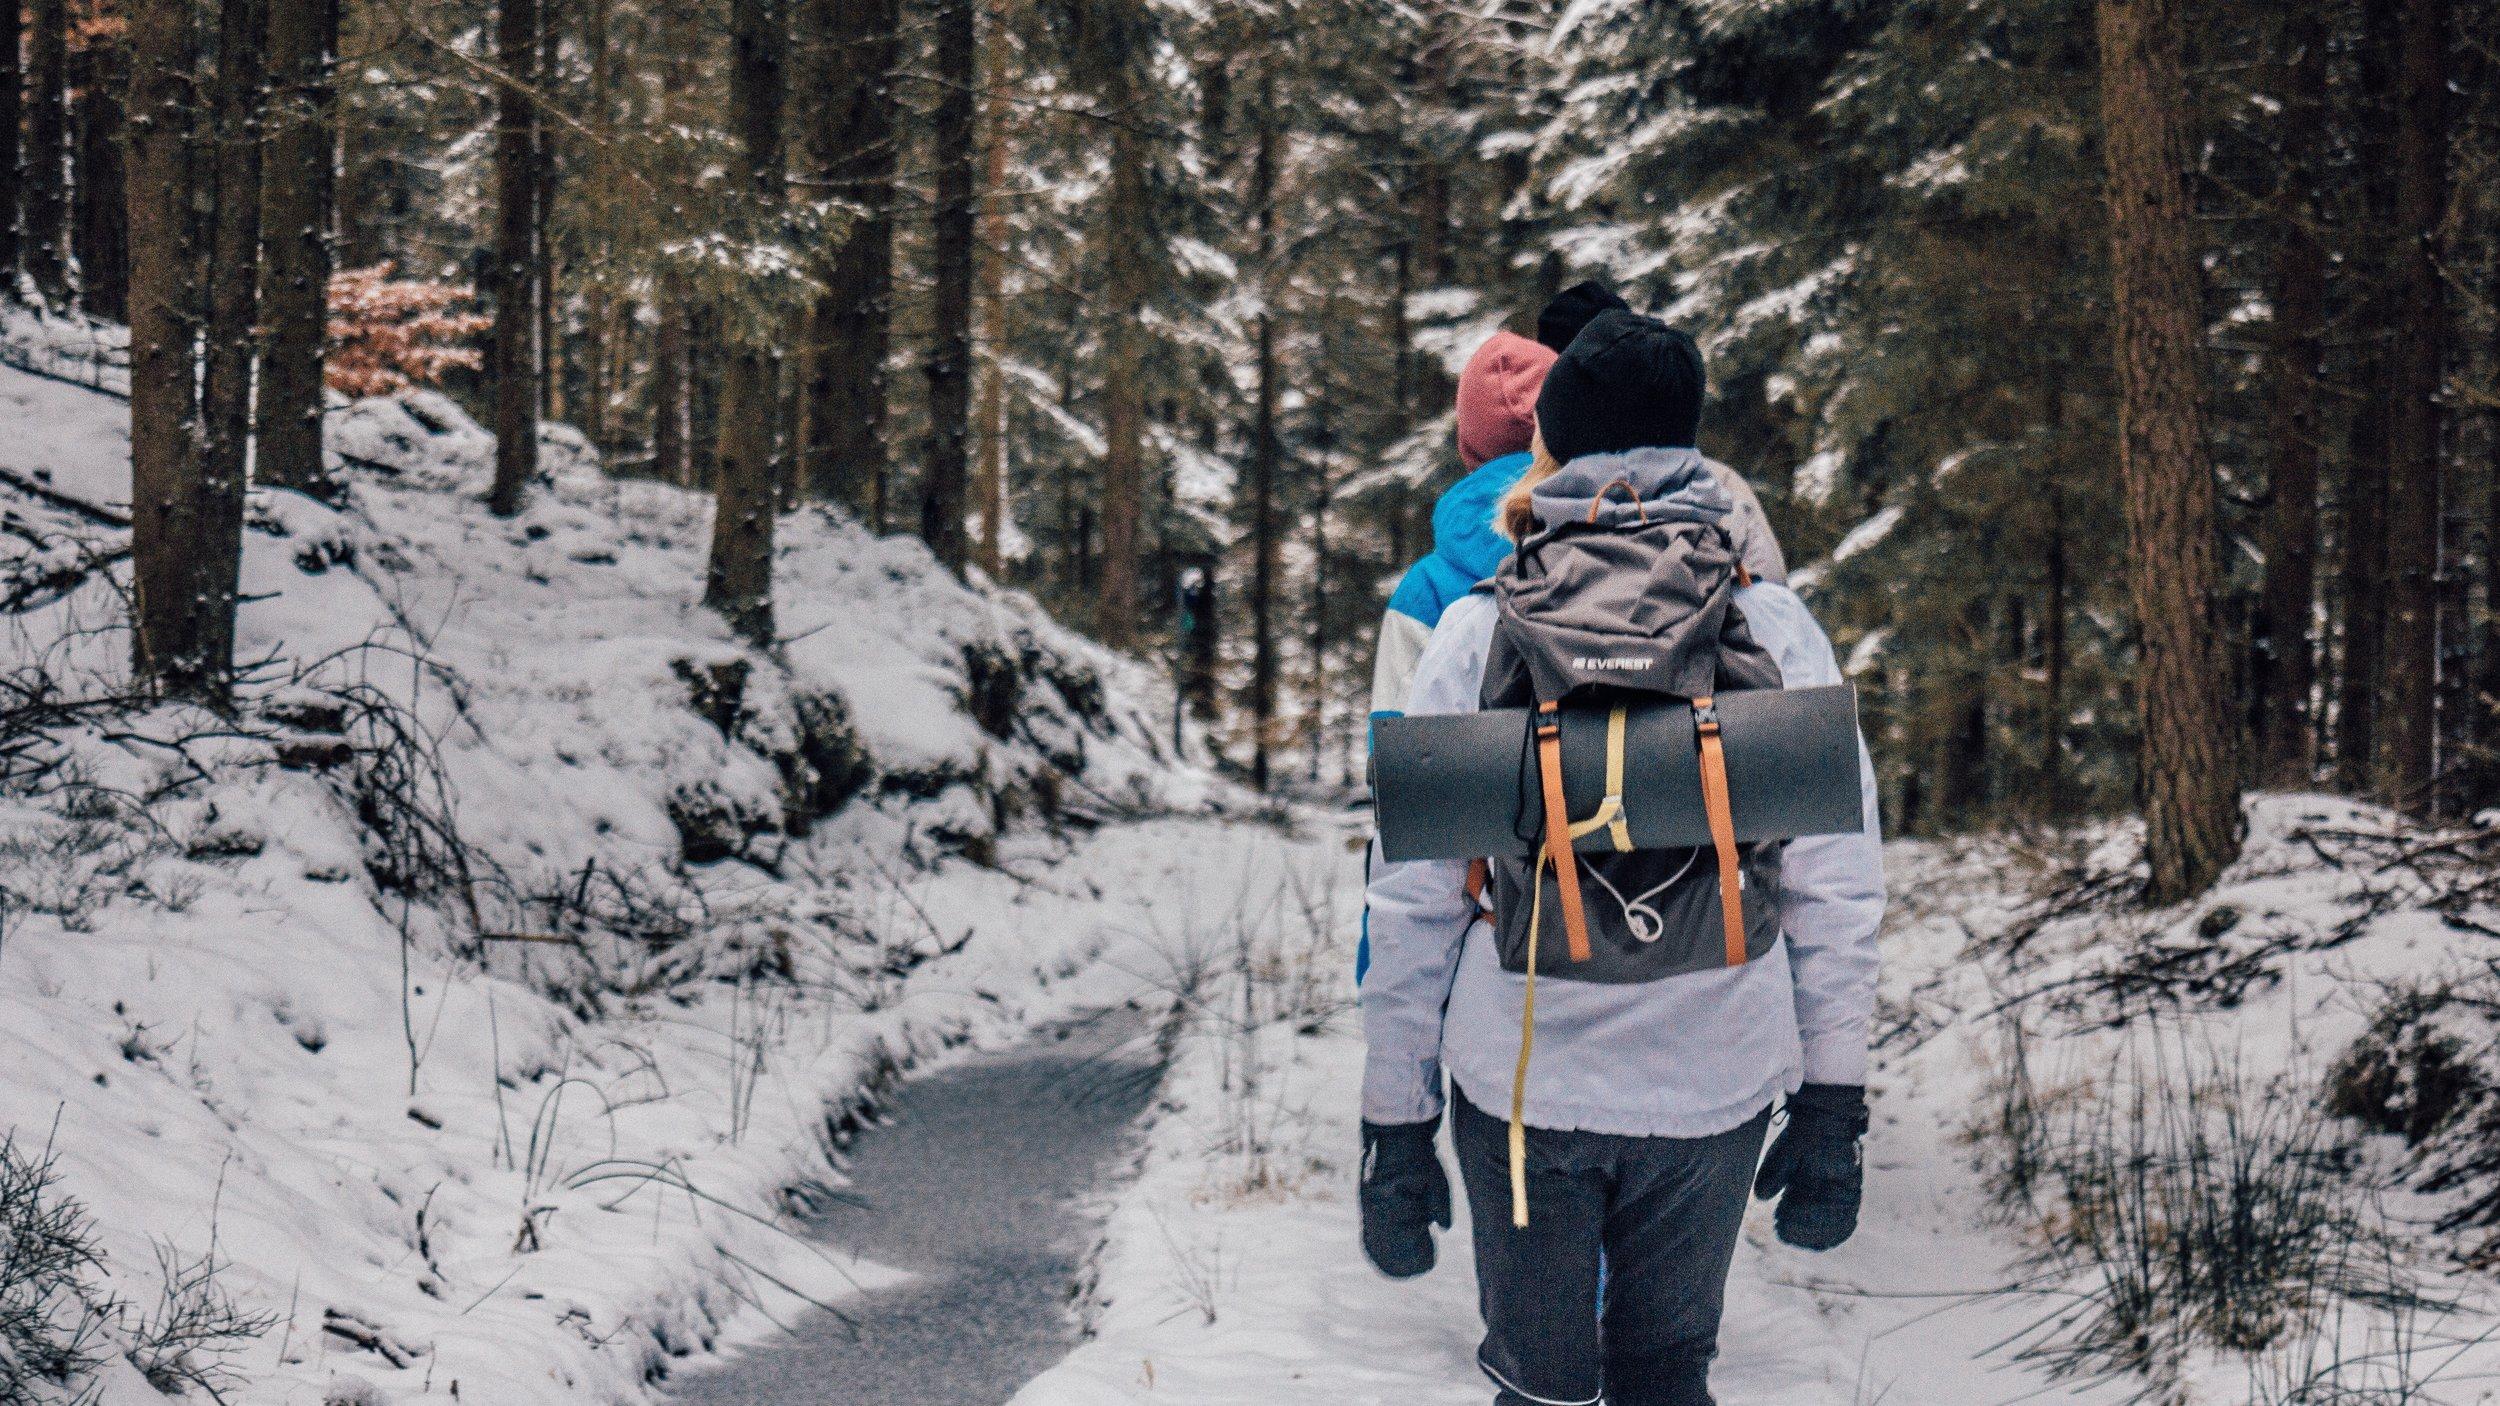 adventure-backpack-backpacker-834977.jpg